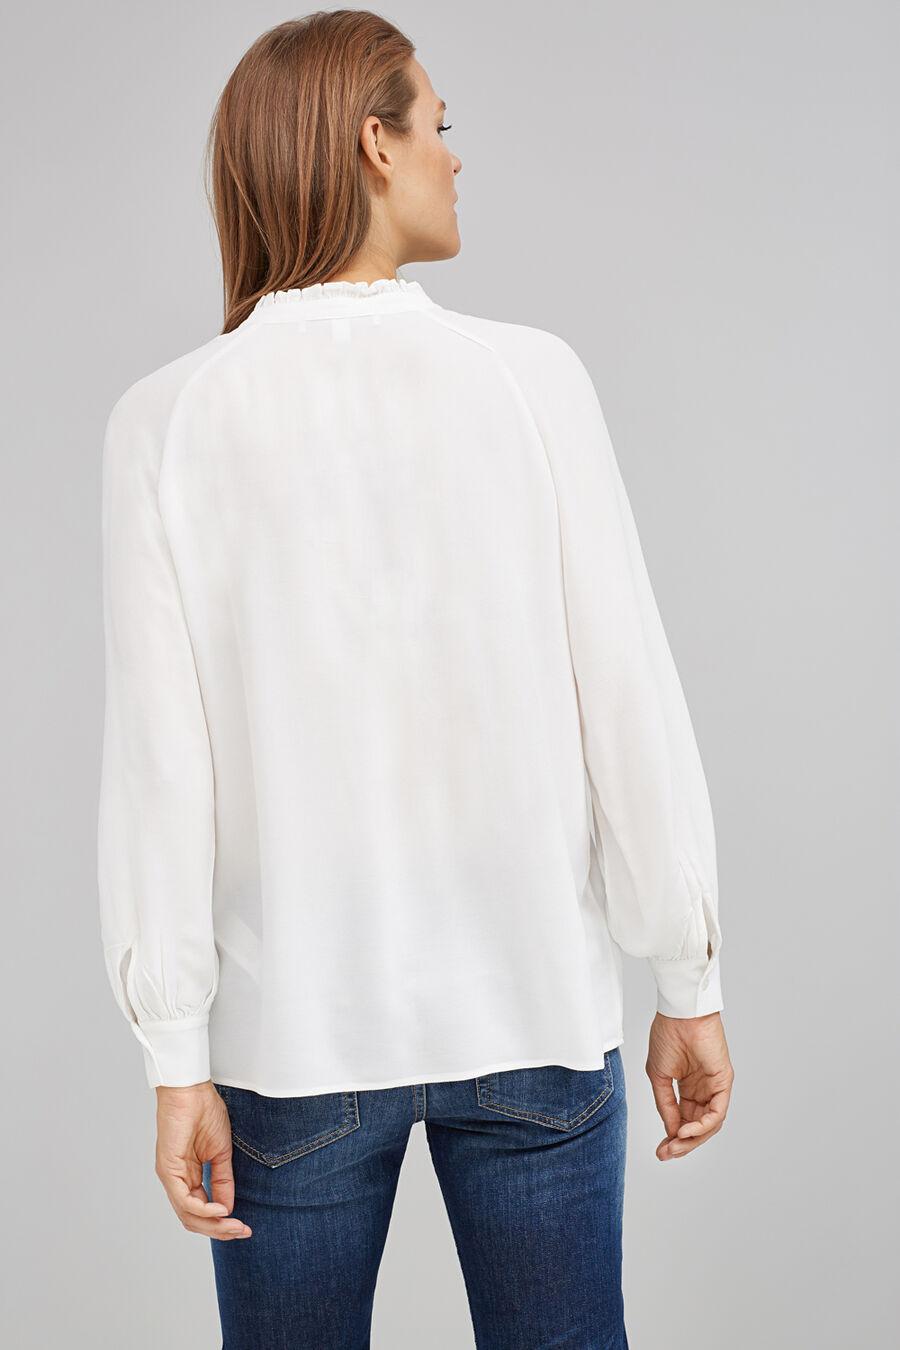 Bows blouse